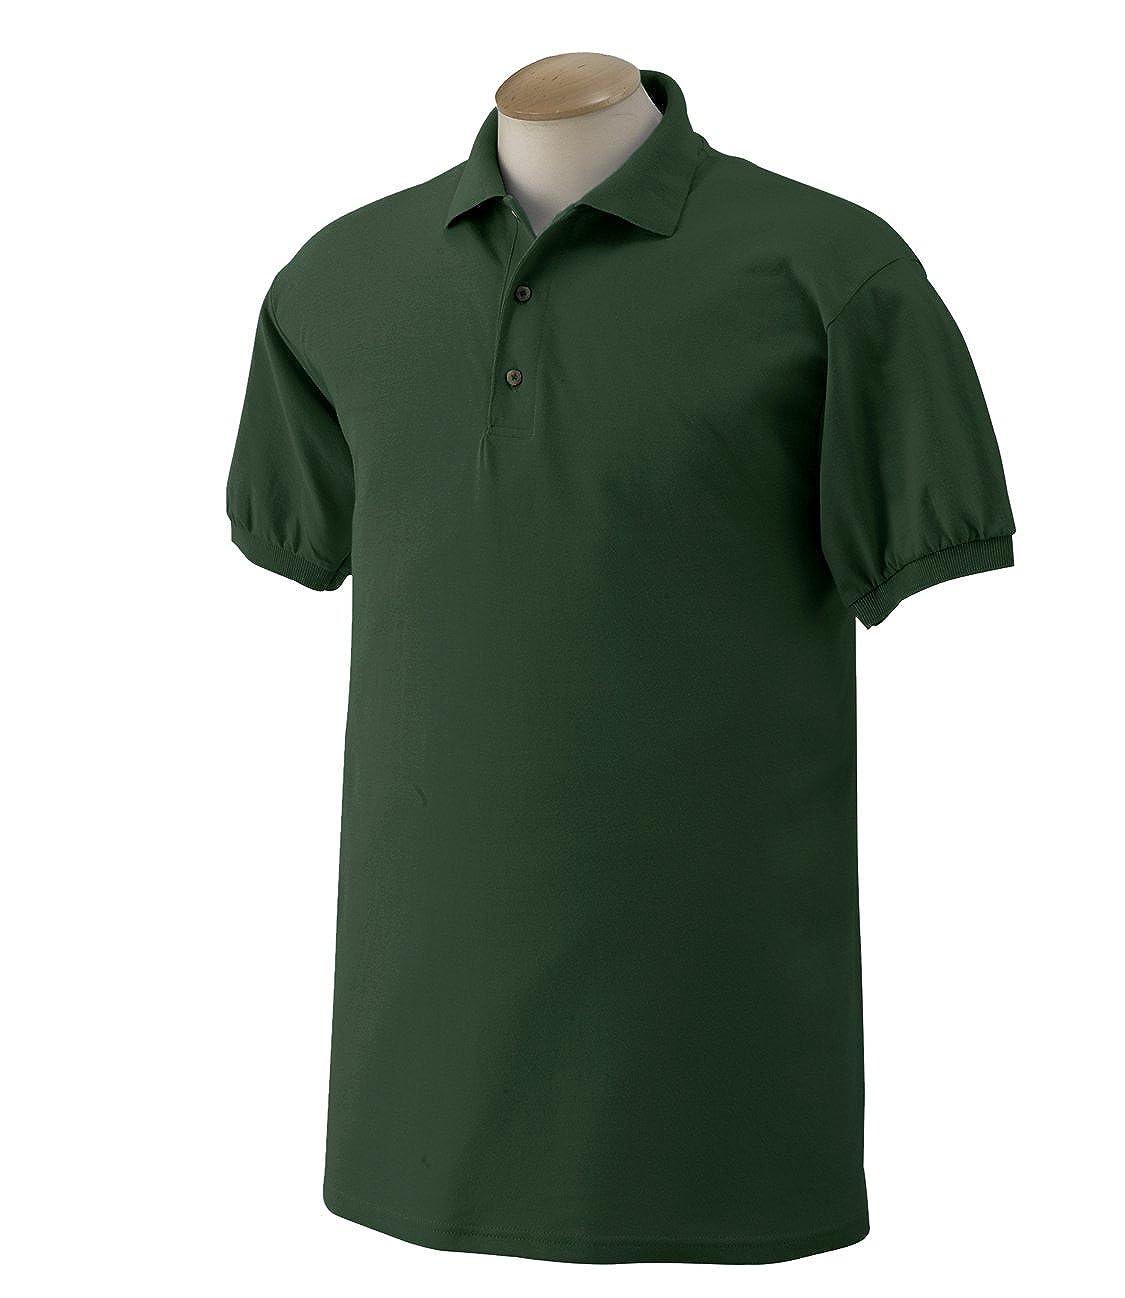 G880/_FOREST GREEN/_Large Gildan DryBlend 6 oz. 50//50 Jersey Polo